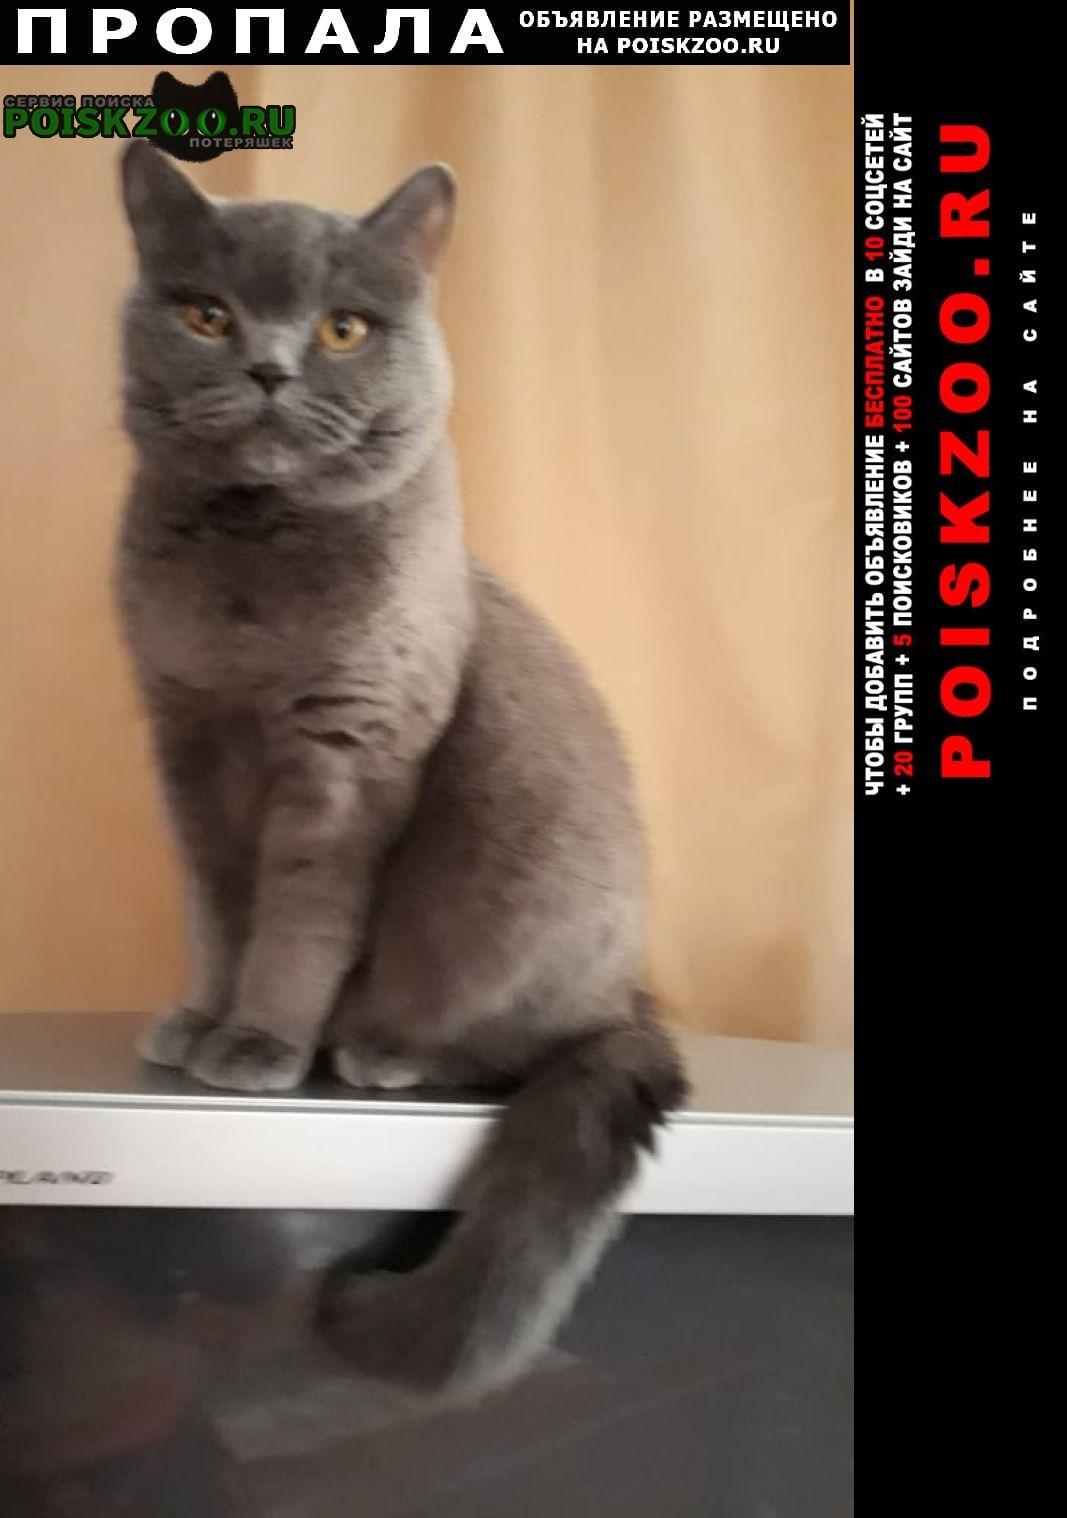 Пропала кошка британка в р-не куркино Москва